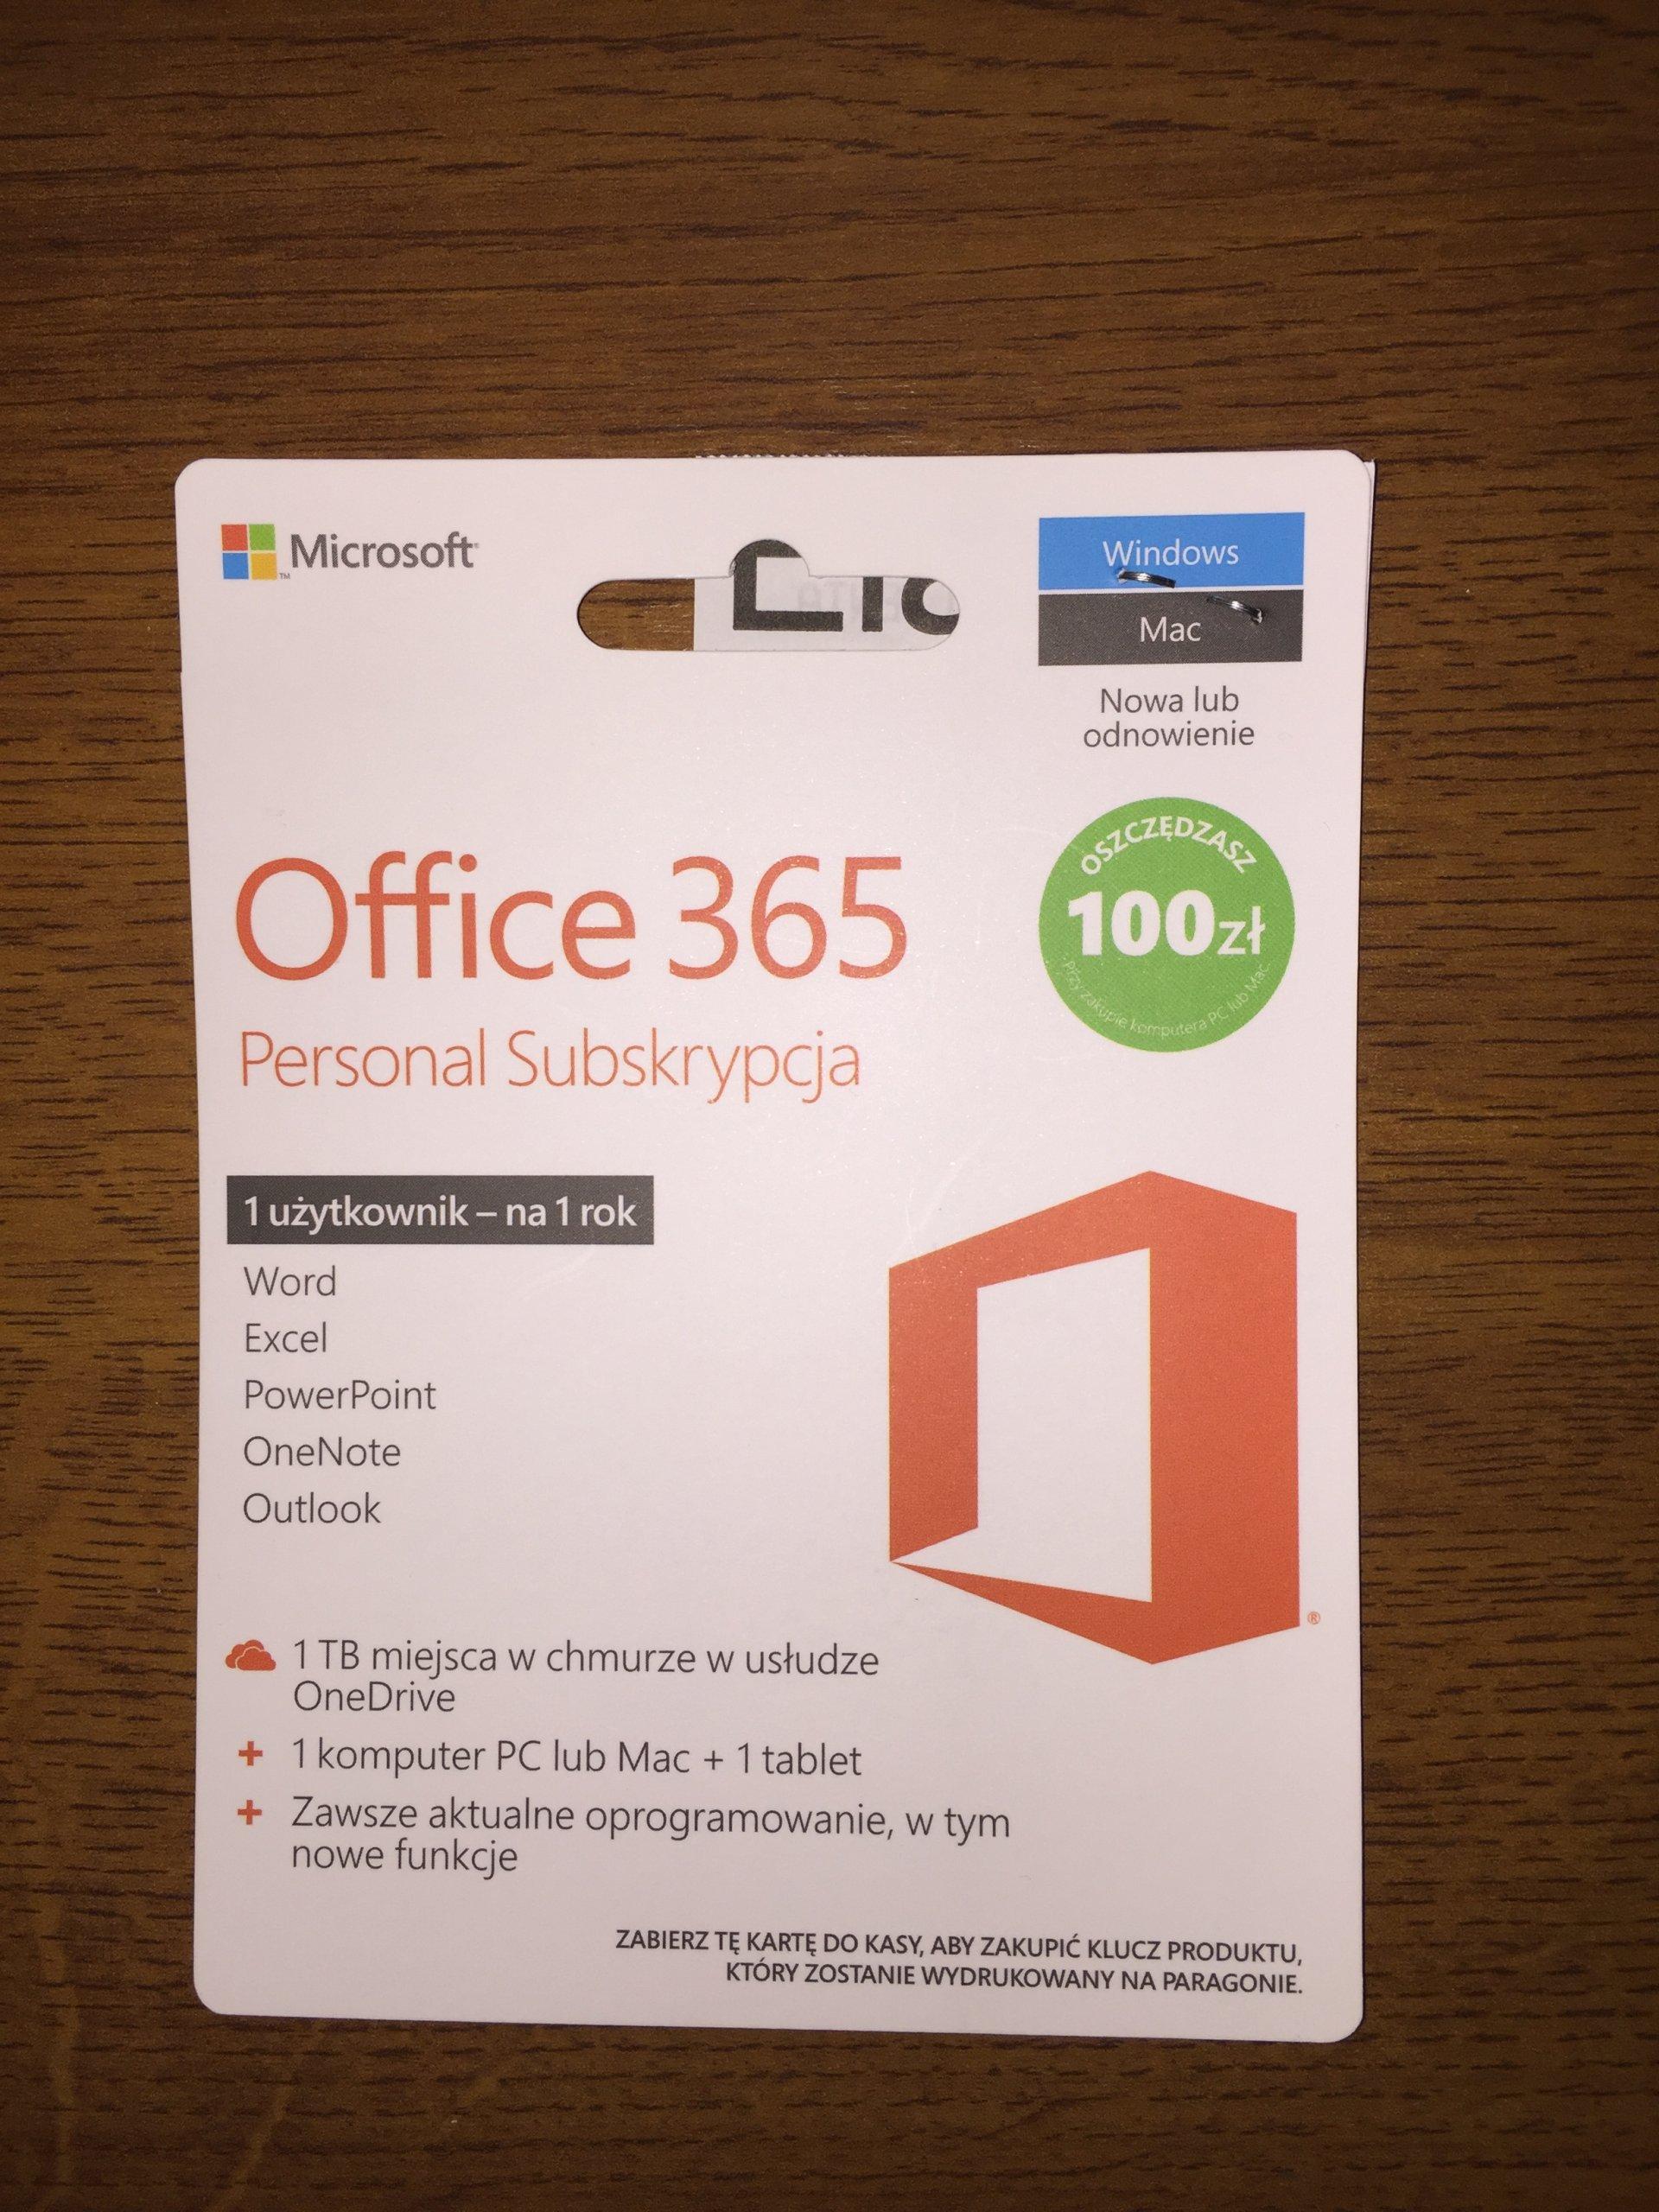 Roczna subskrypcja Office 365 Personal